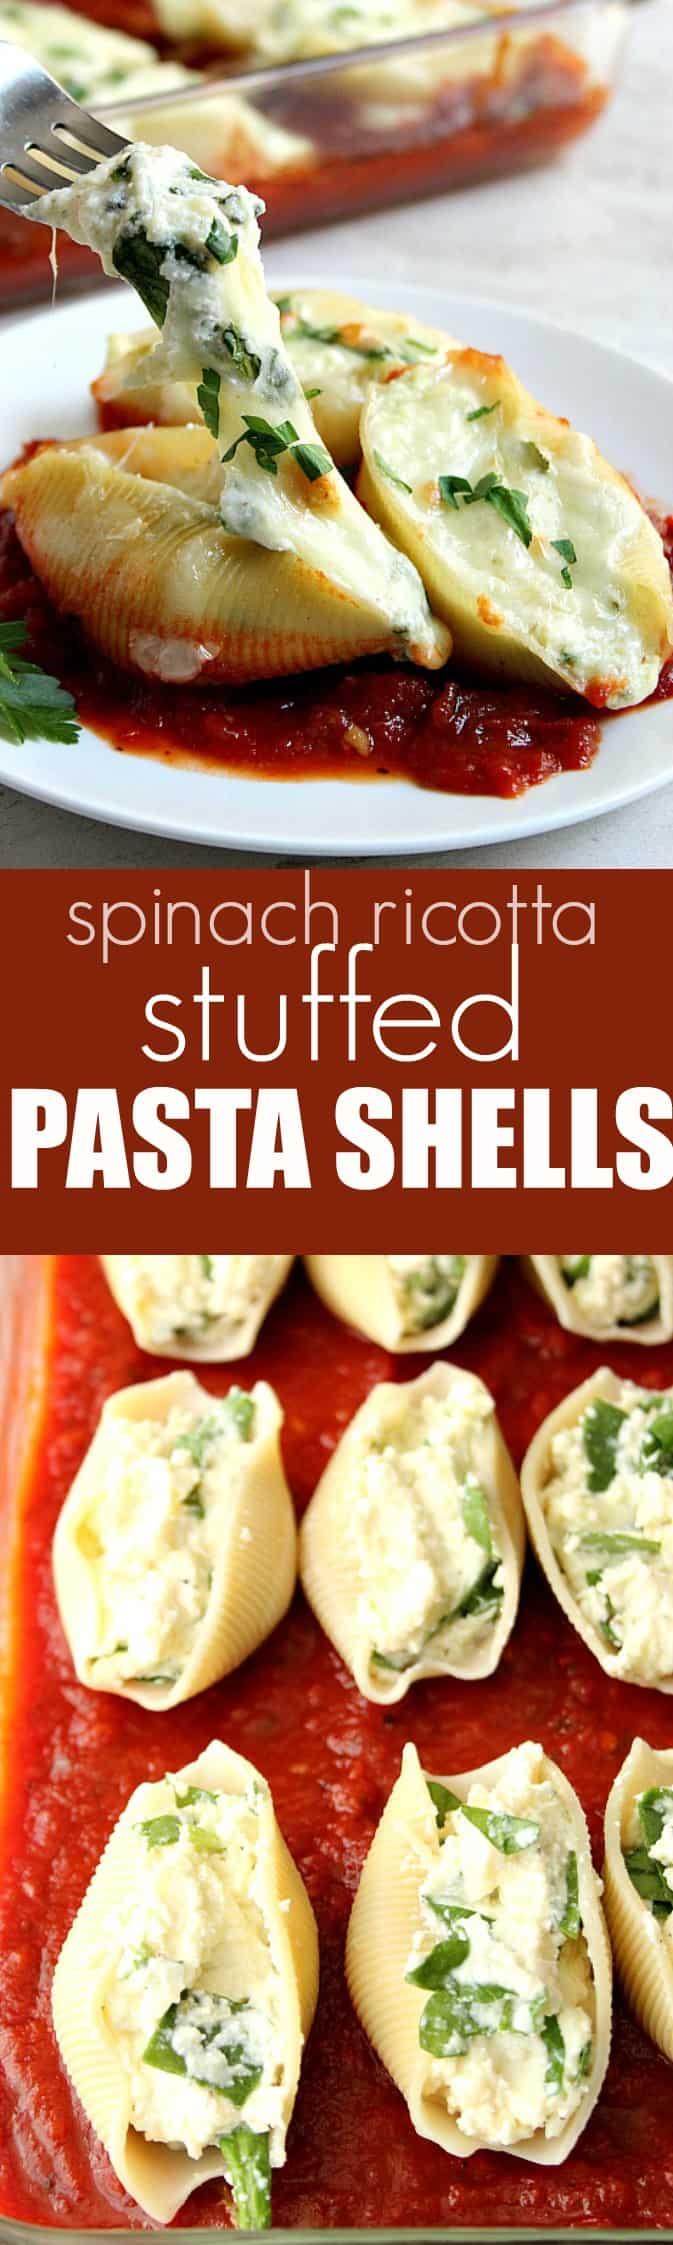 Spinach Ricotta Stuffed Pasta Shells long Spinach and Ricotta Stuffed Pasta Shells Recipe